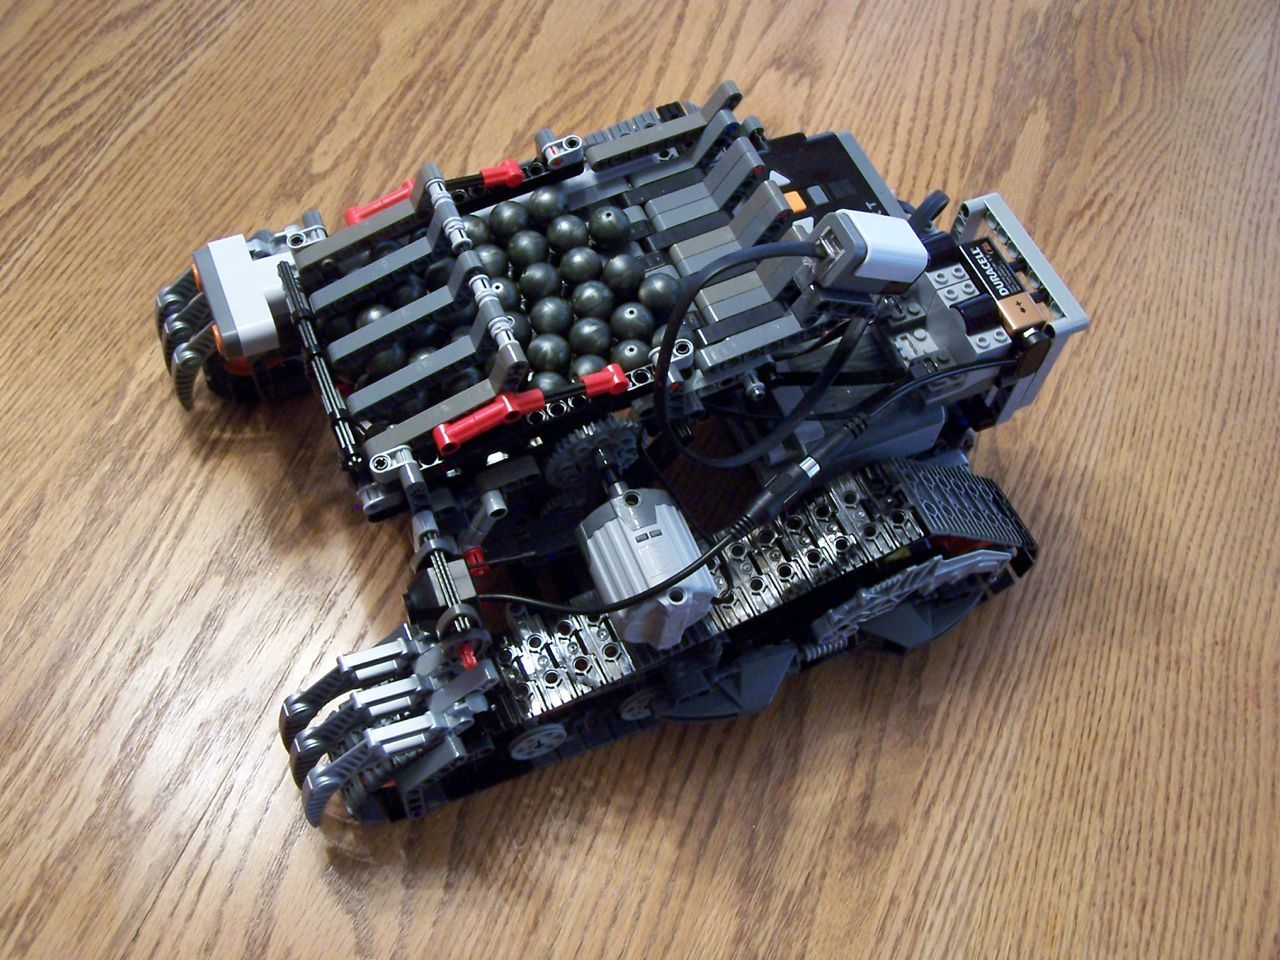 Ogre A Lego Nxt Based Tank Lego Nxt Lego Technic Lego